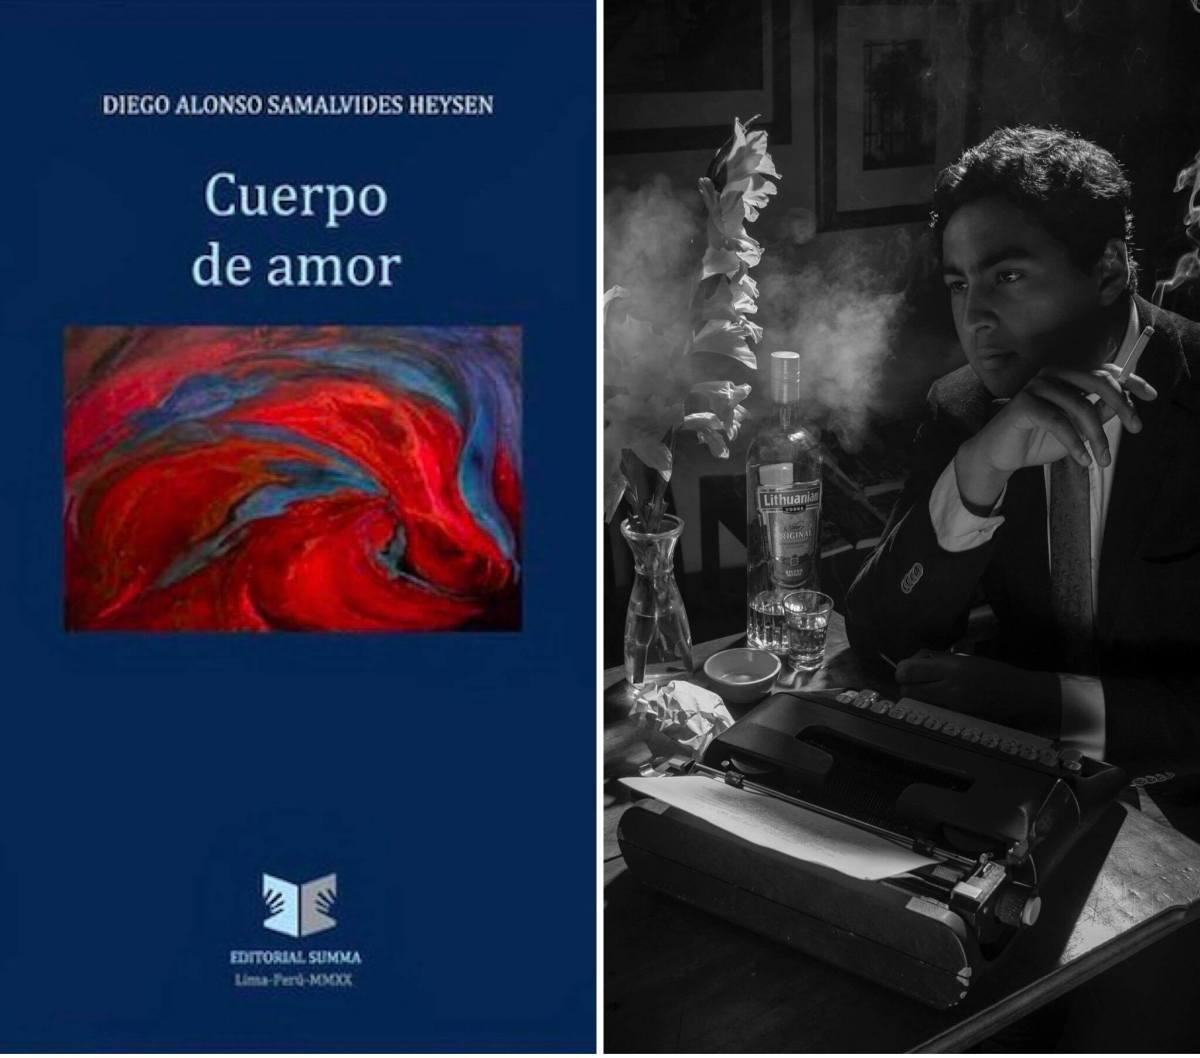 Diego Alonso Samalvides Heysen, inediti del poetaPeruviano